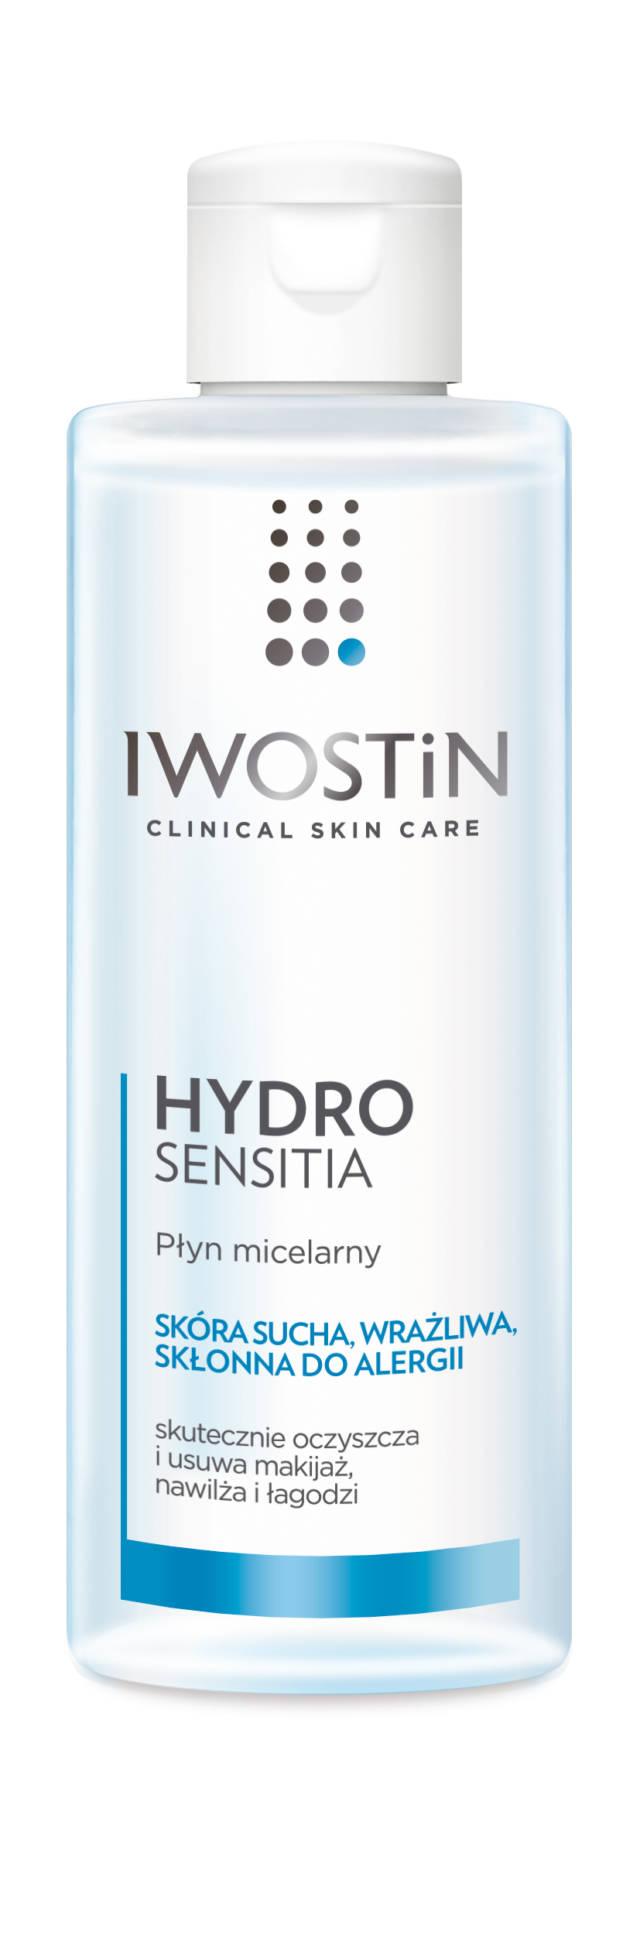 IWOSTIN HYDRO SENSITIA Płyn micelarny 215ml